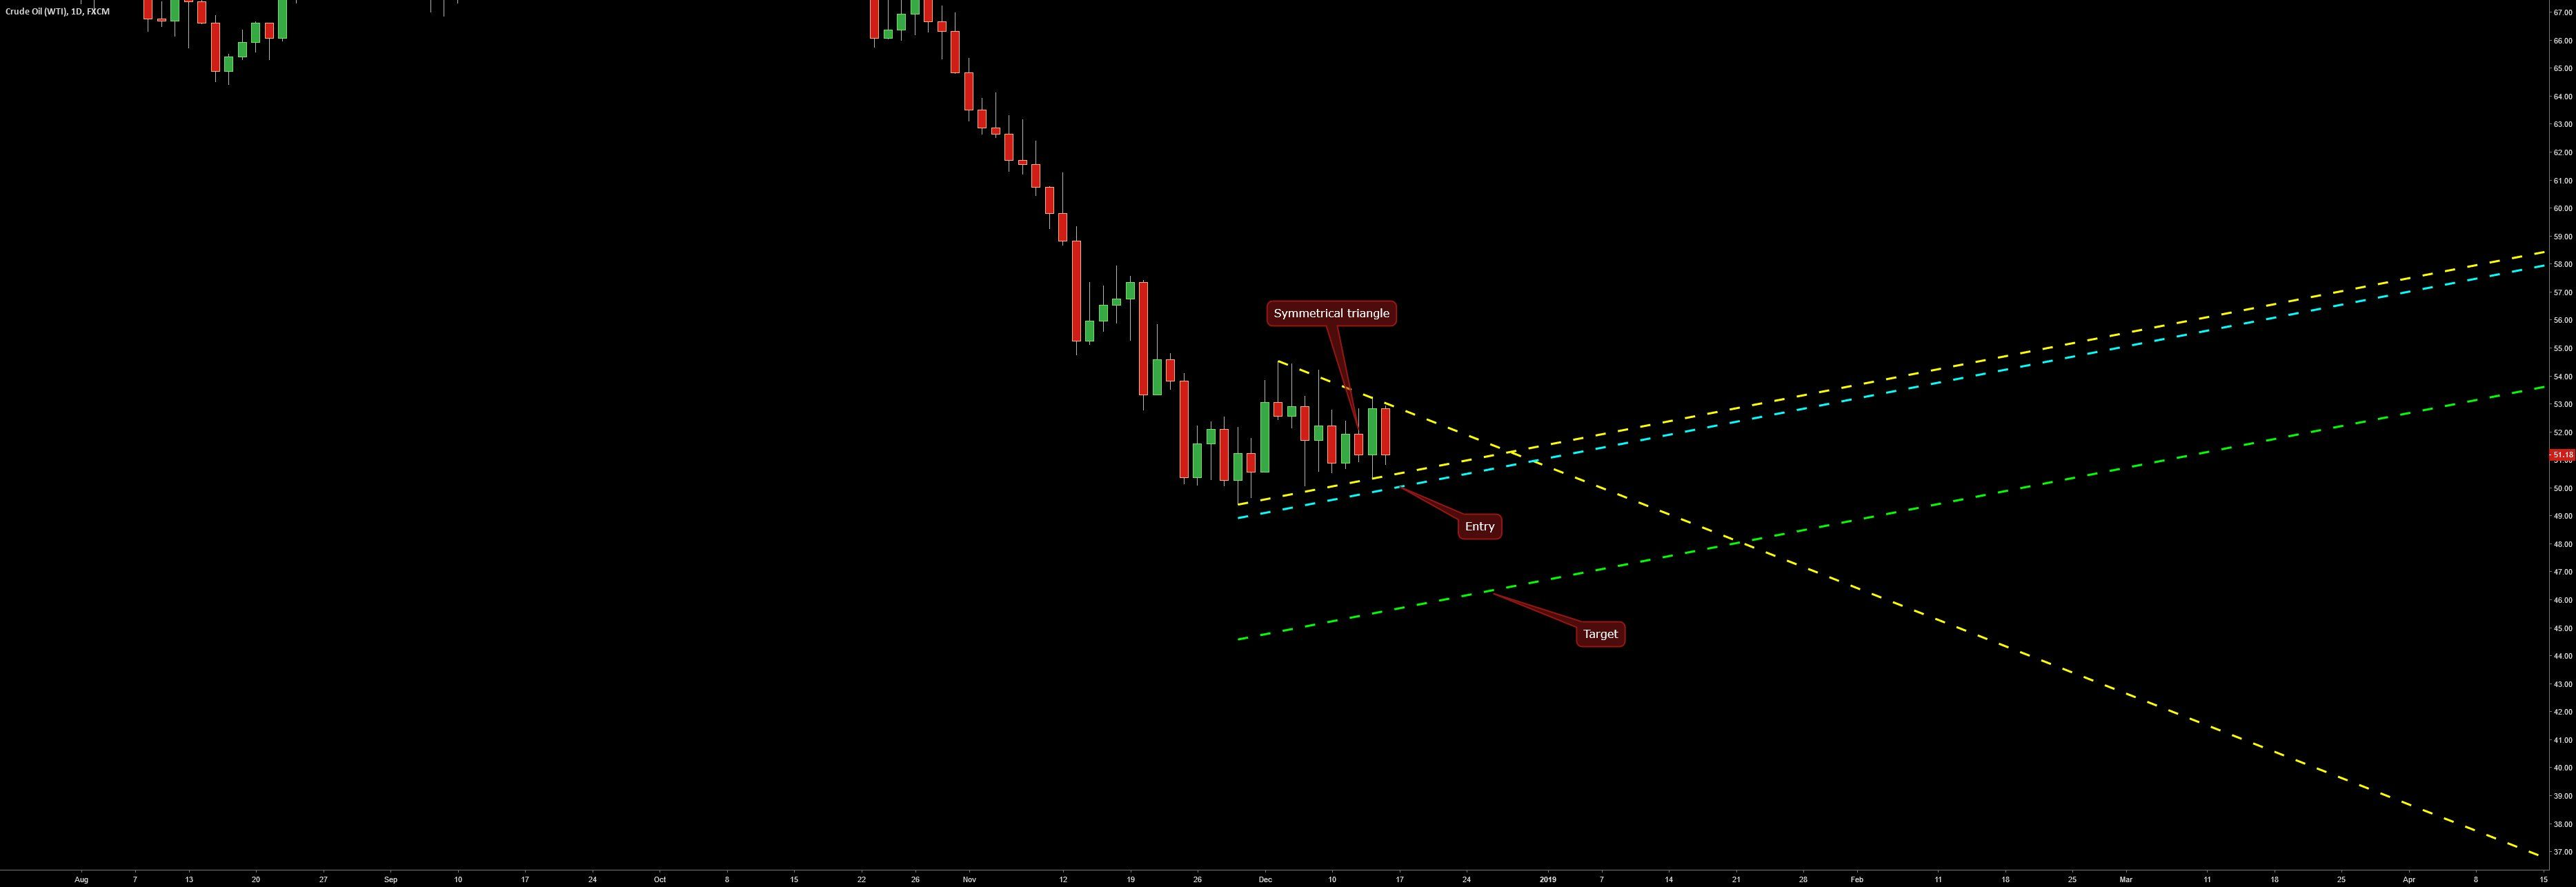 Symmetrical Triangle On Wti Oil D1 Forex